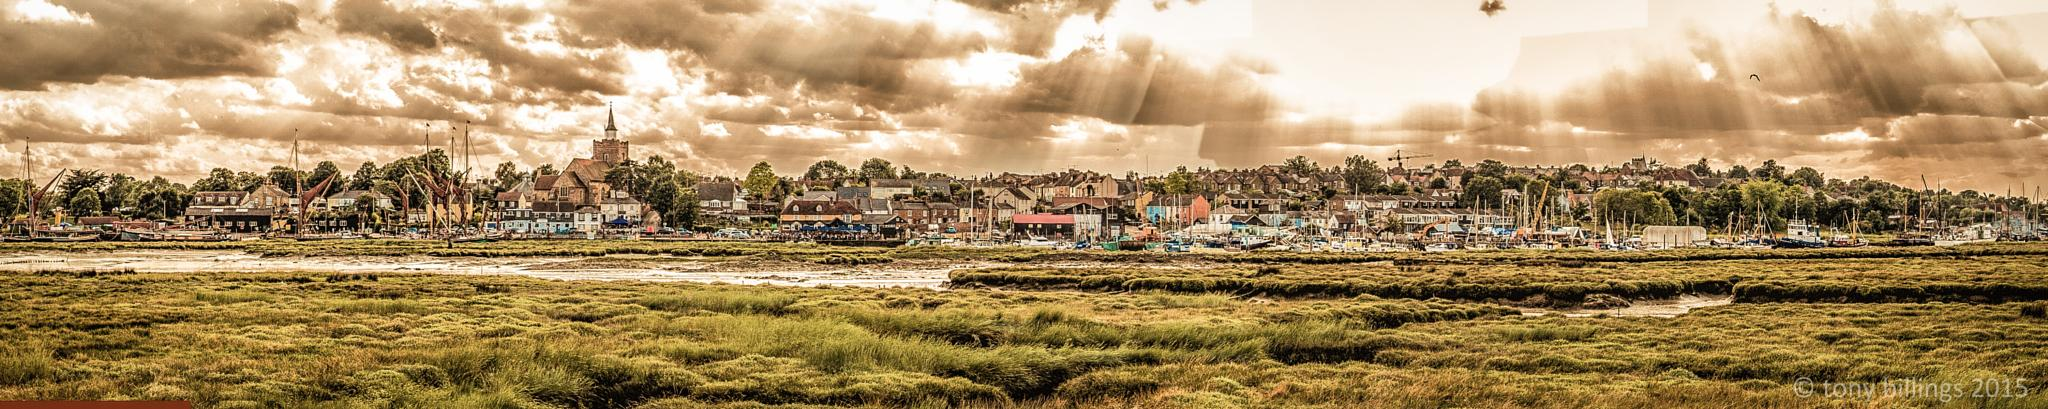 Maldon Panorama by tony billings